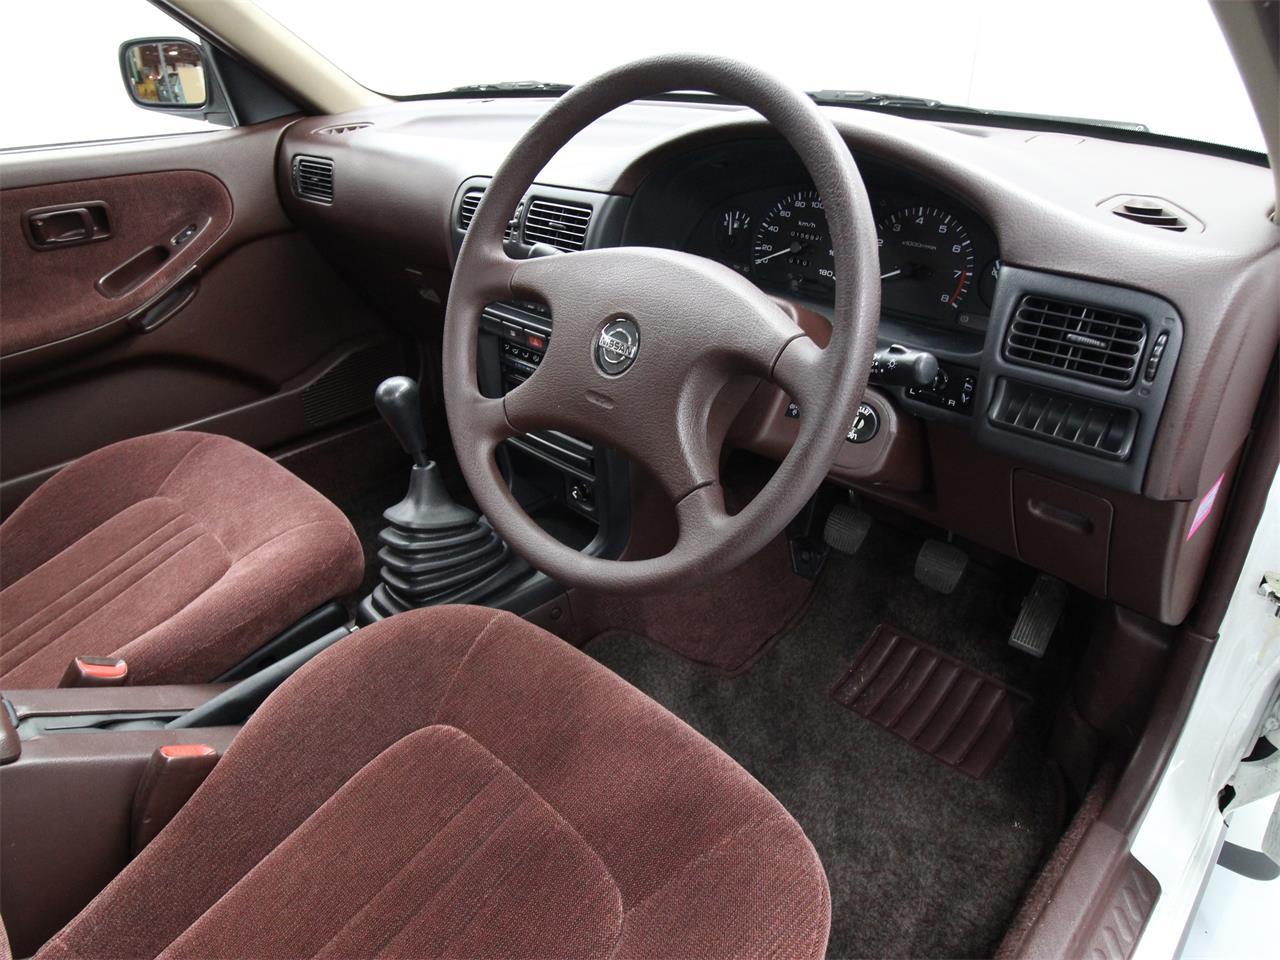 1991 Nissan Sunny (CC-1267972) for sale in Christiansburg, Virginia